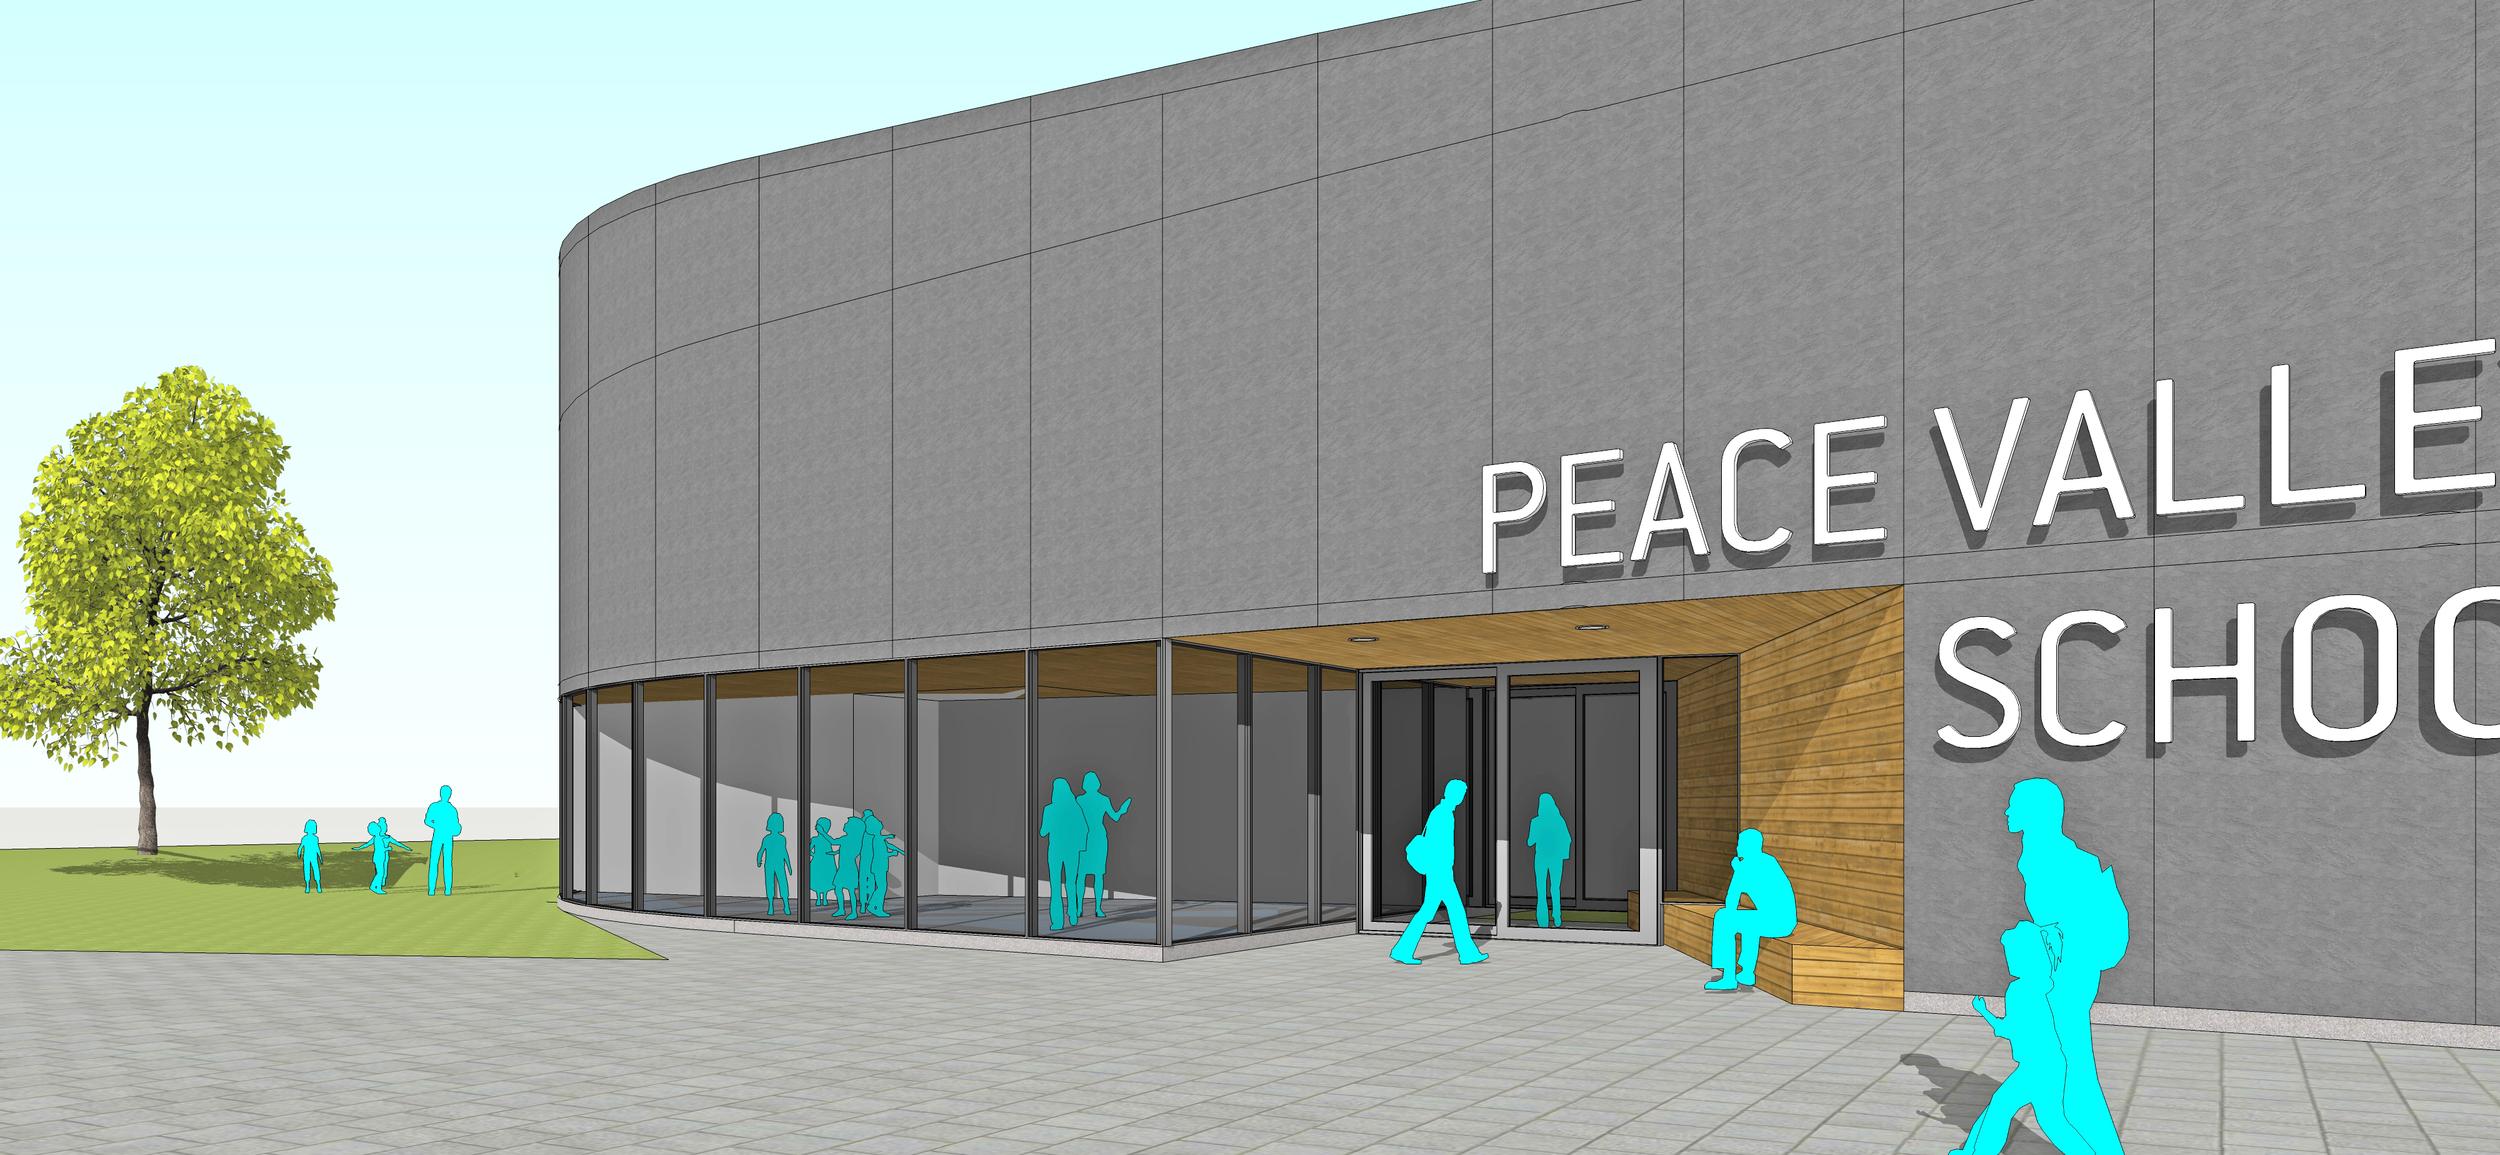 2013_14_Peace Valley School_Entry 1.jpg